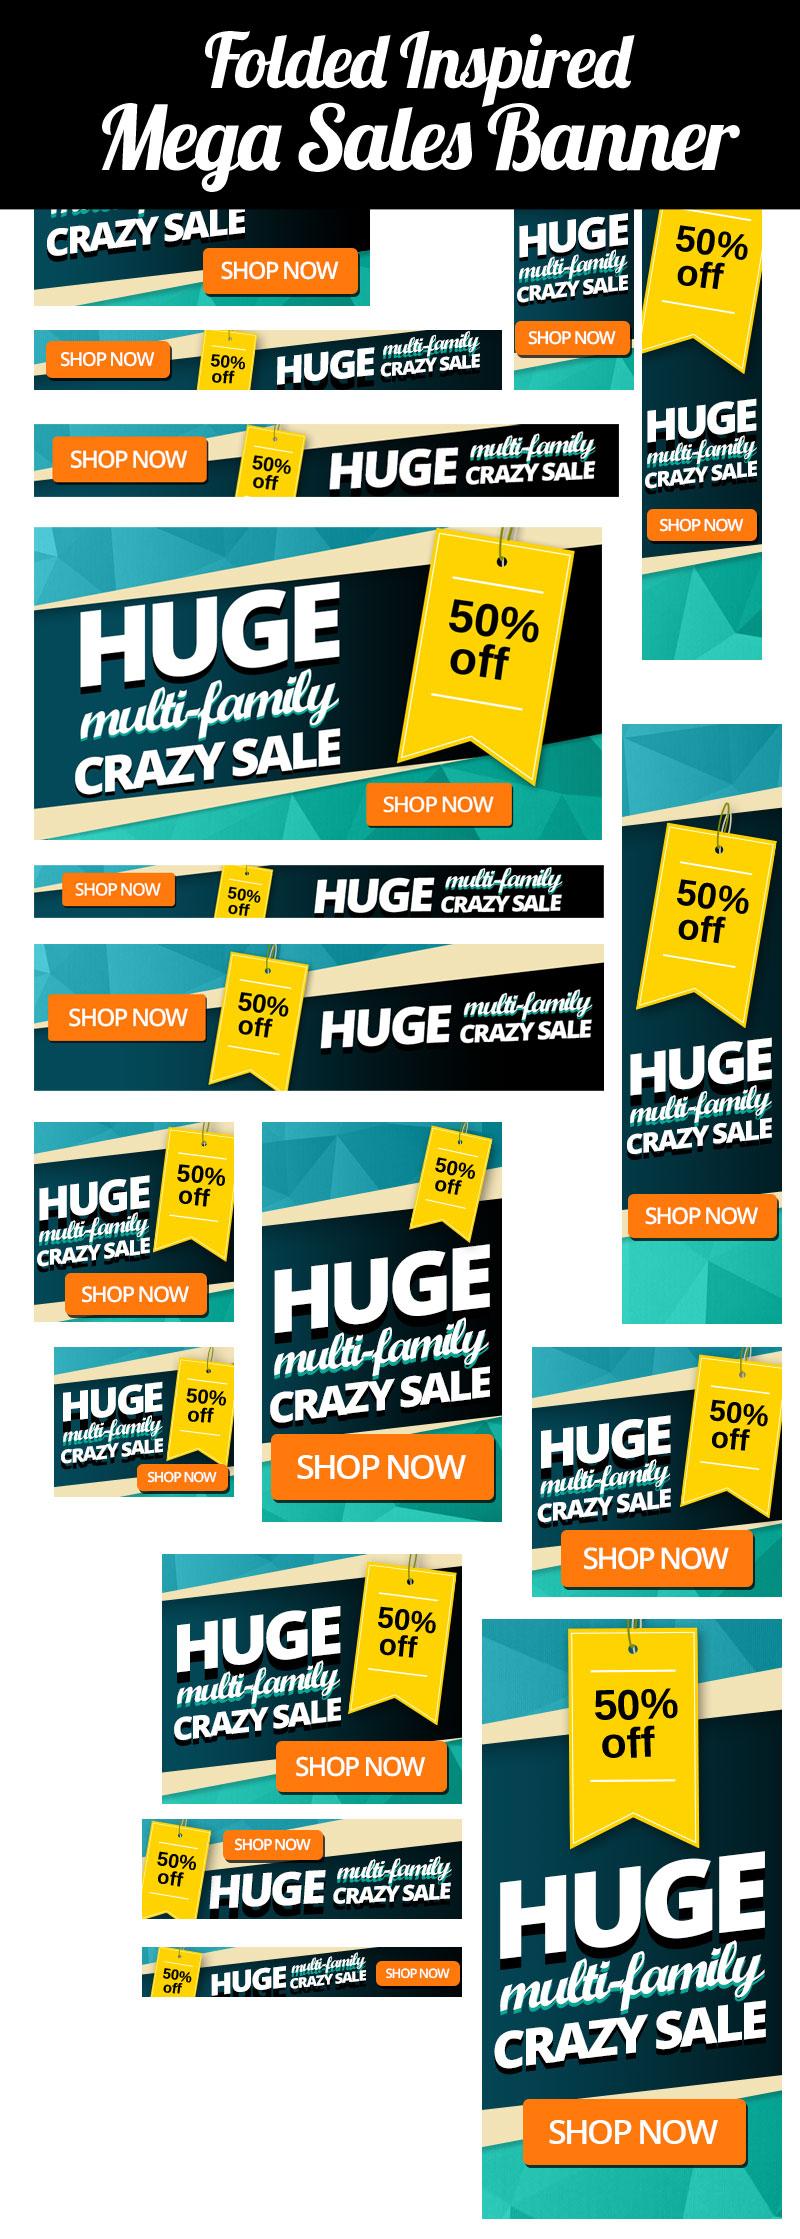 Folded-Inspired-Mega-Sale-Banners